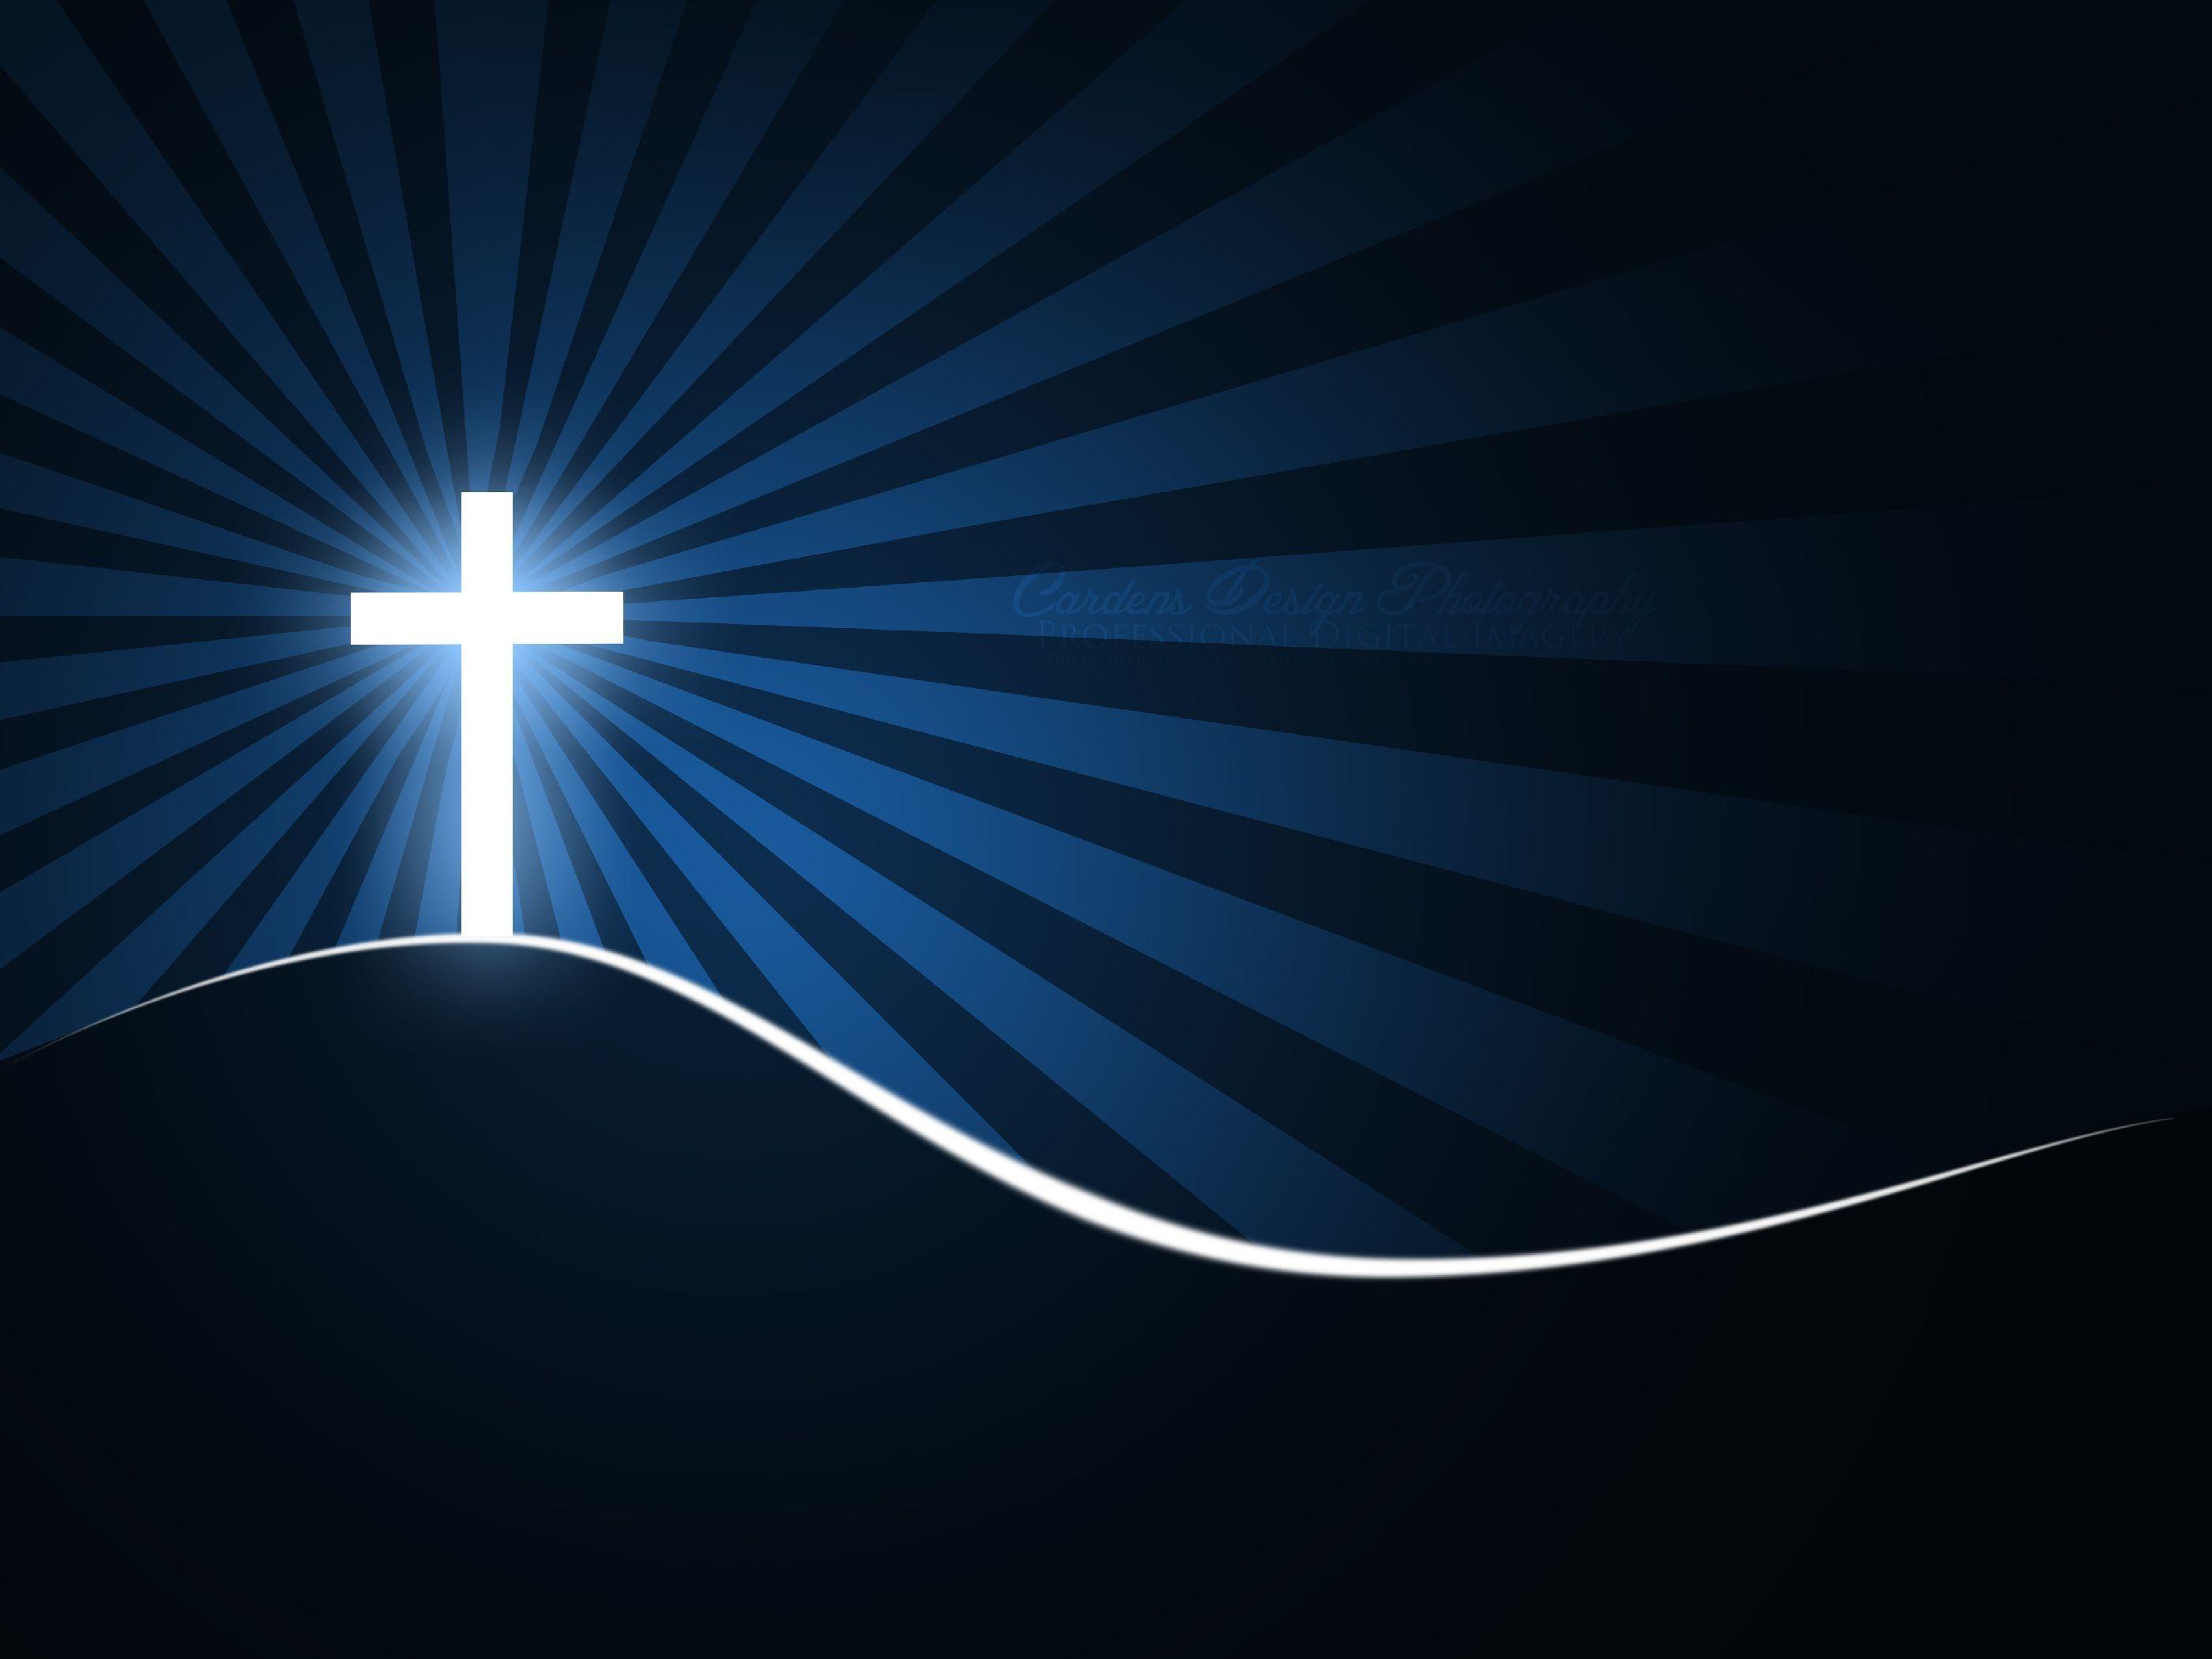 Jesus Christ On The Cross Wallpapers Cross Wallpaper Cross Background Jesus Cross Wallpaper